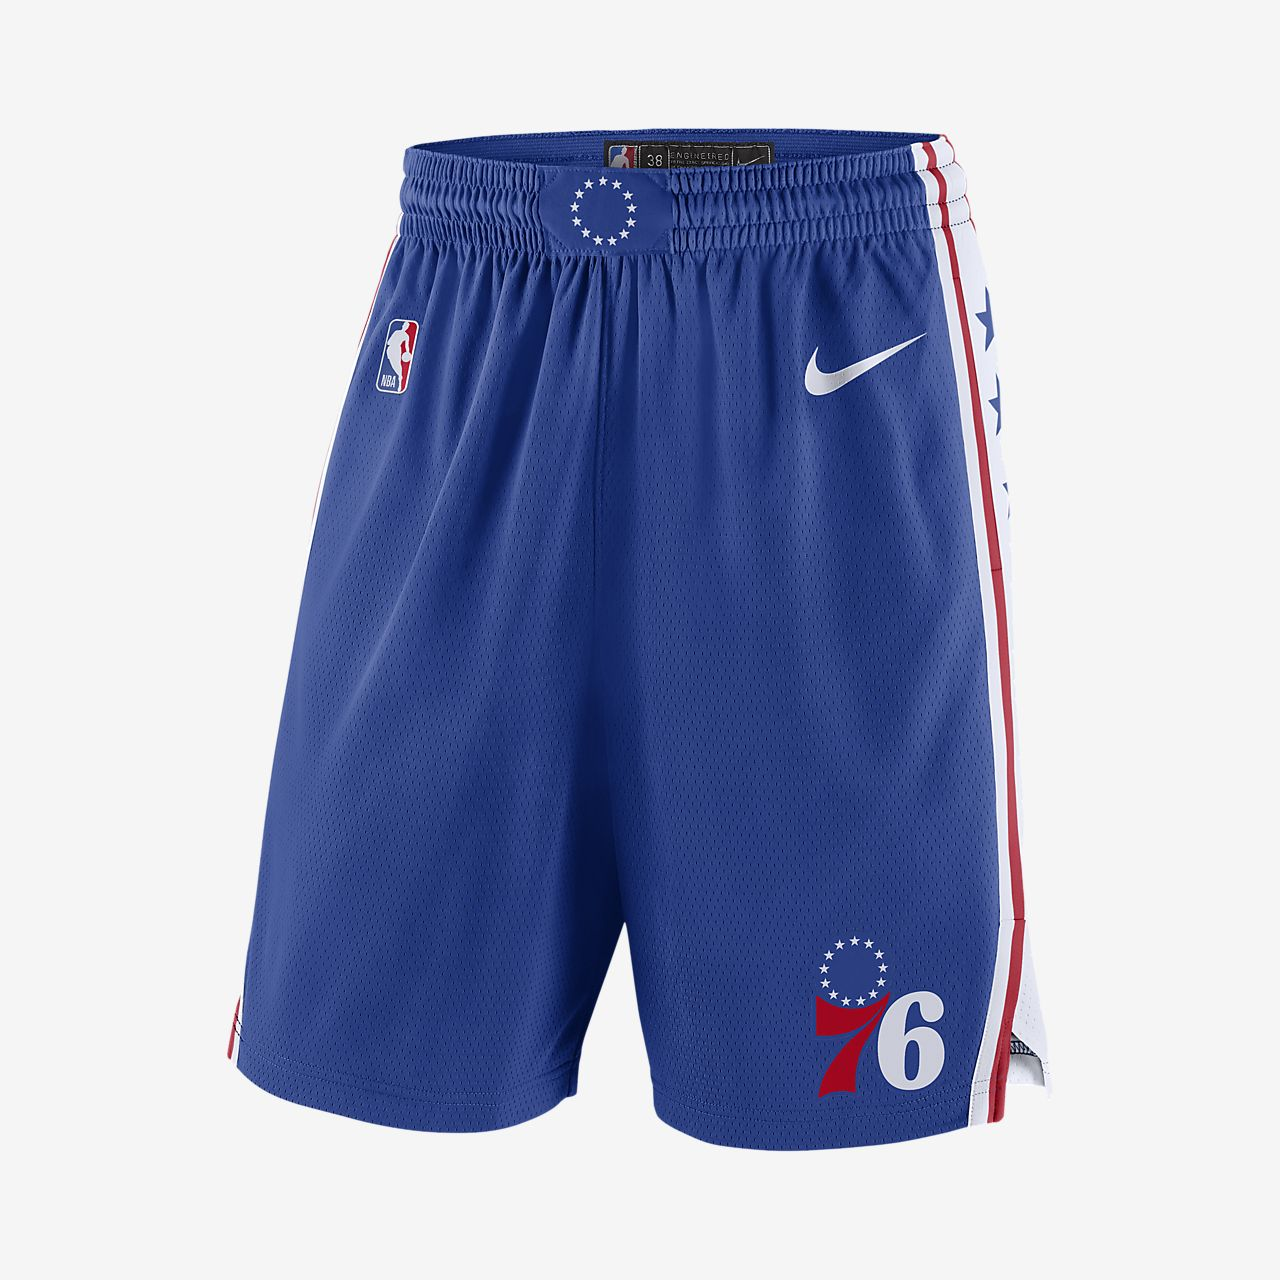 Shorts Nike de la NBA para hombre Philadelphia 76ers Icon Edition Swingman